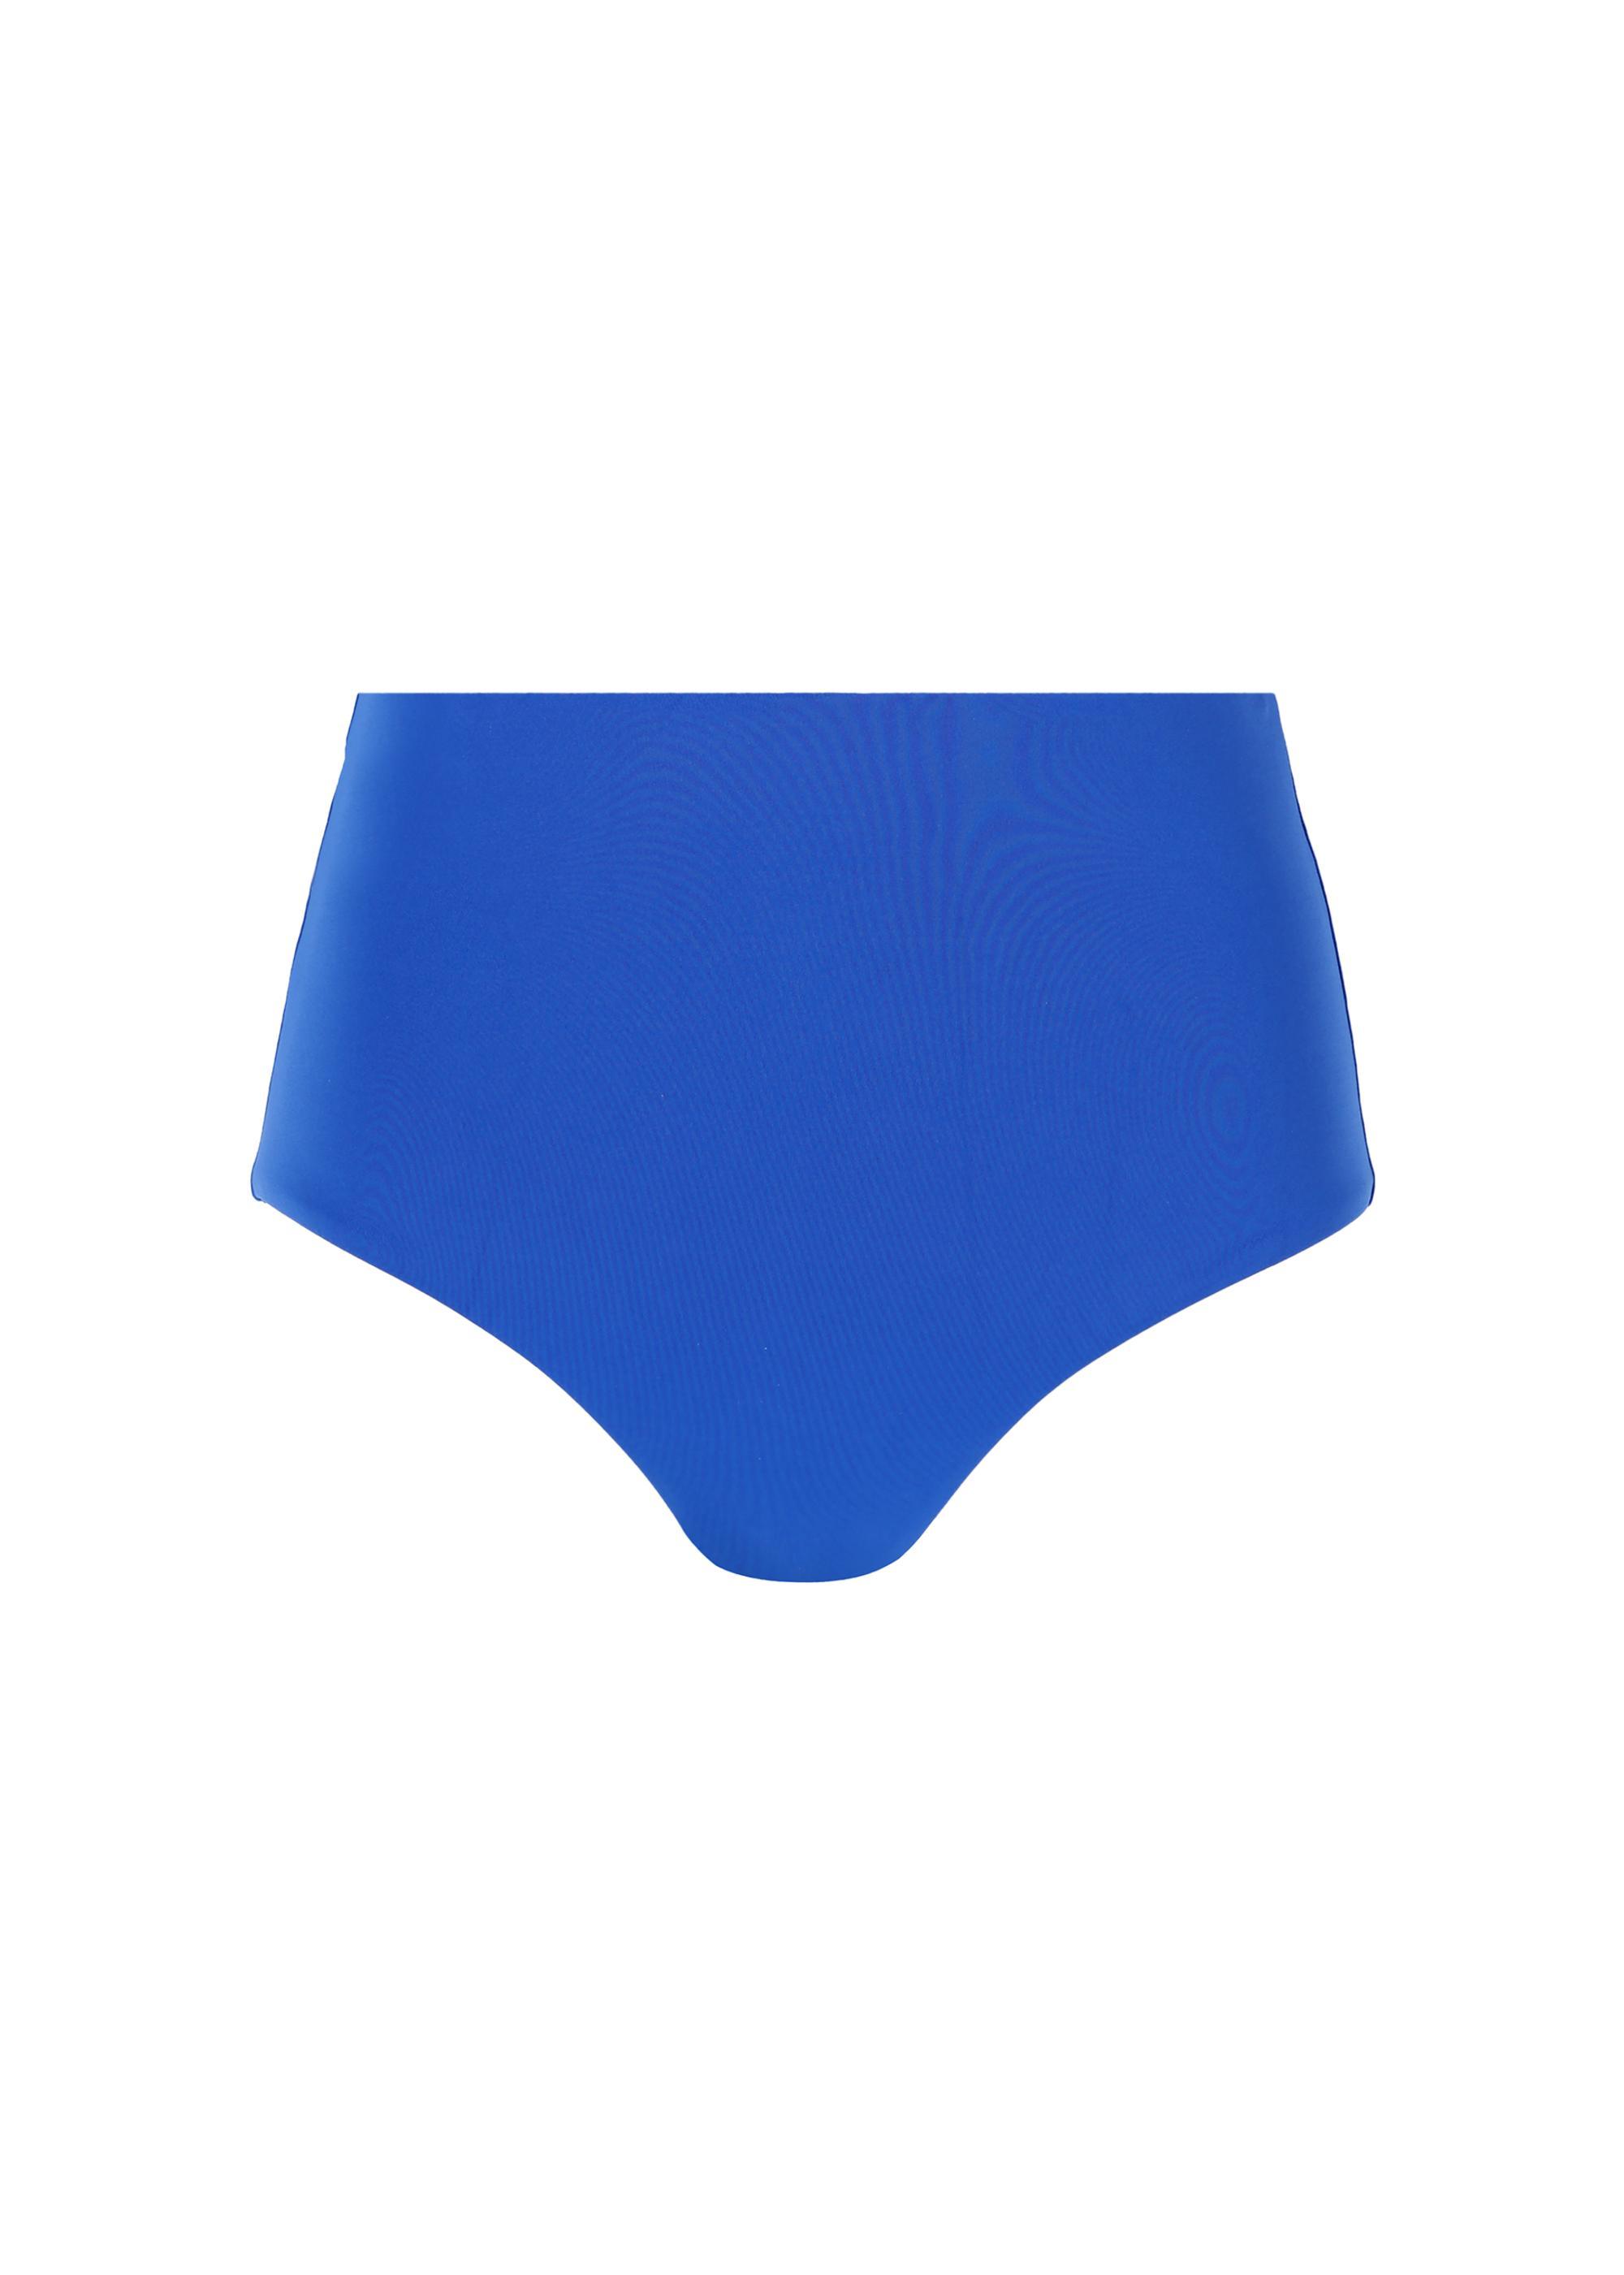 Indonesia Magasderekú Testformázó Bikini Alsó - Calzedonia 0a88ad6501